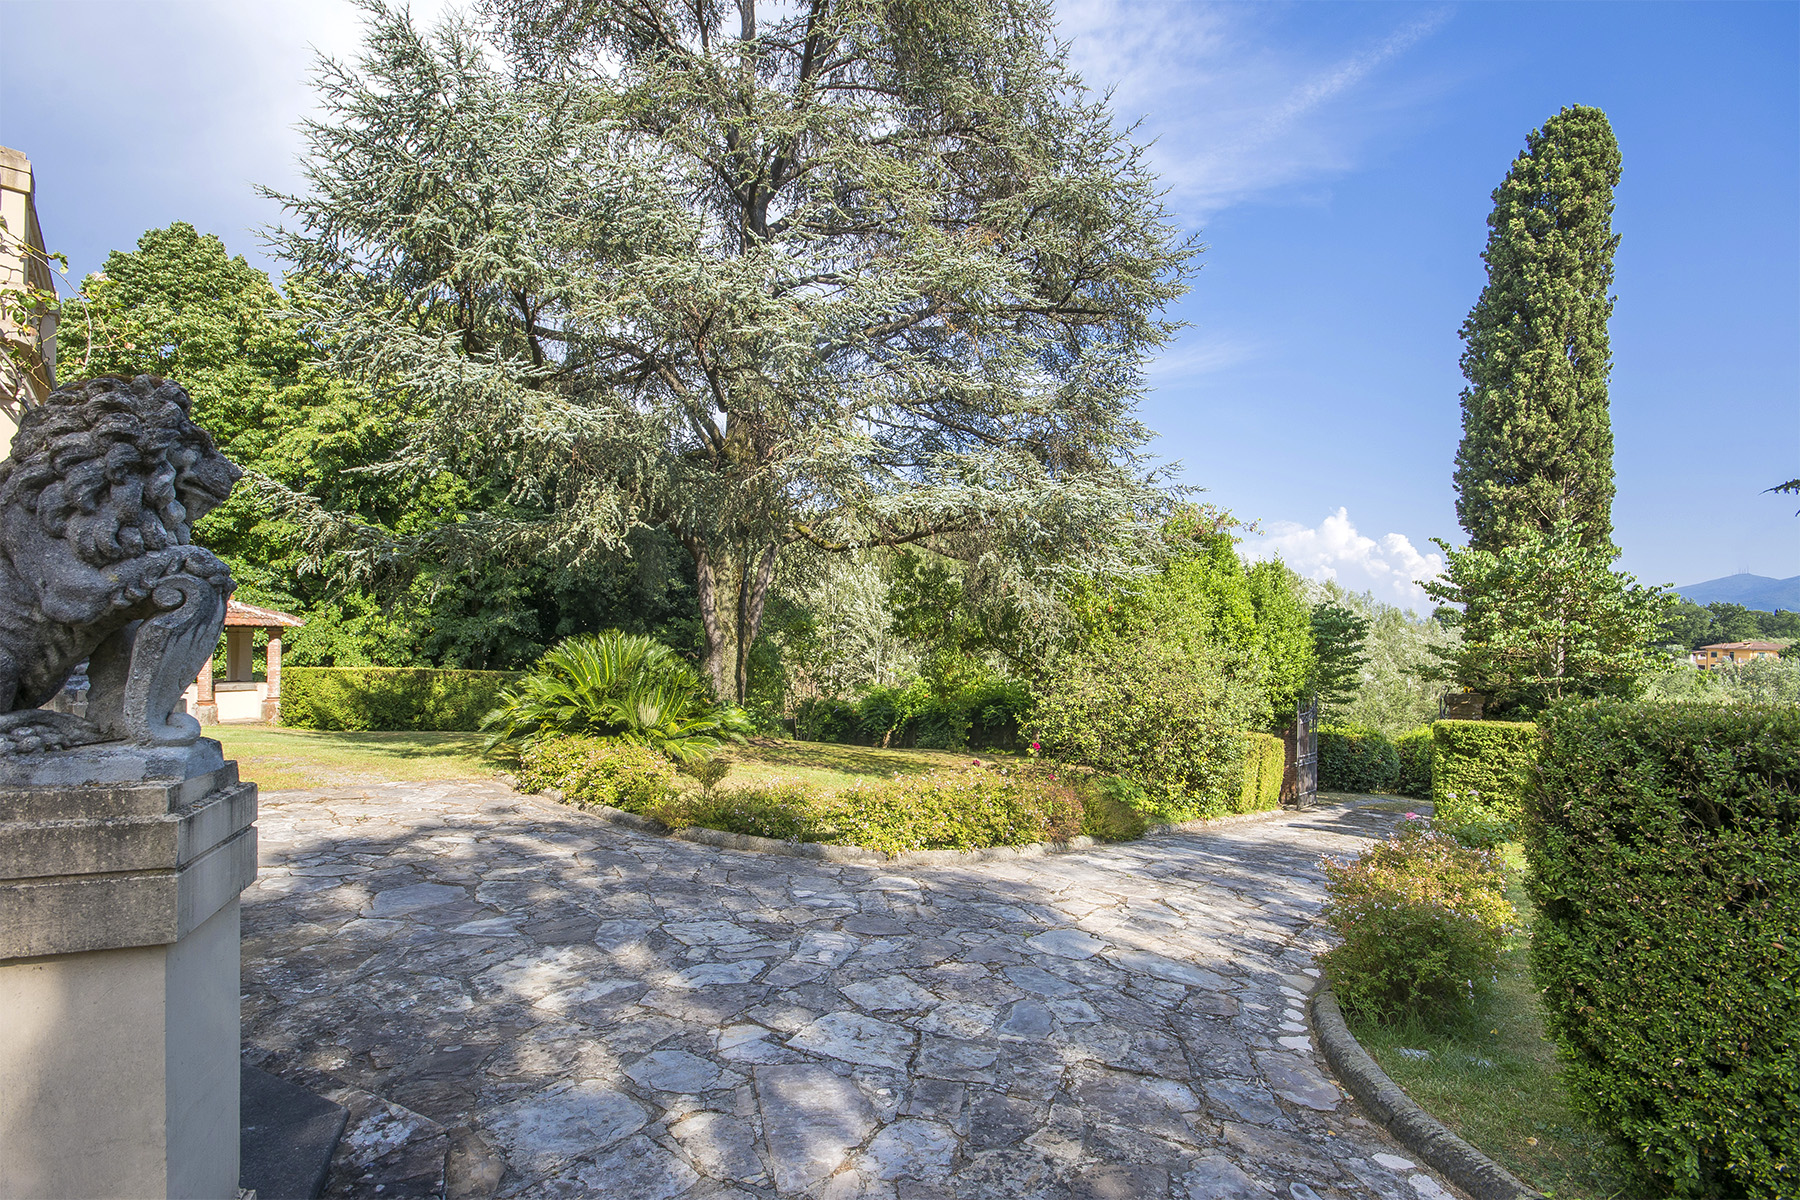 Villa in Vendita a Lucca: 5 locali, 1150 mq - Foto 30